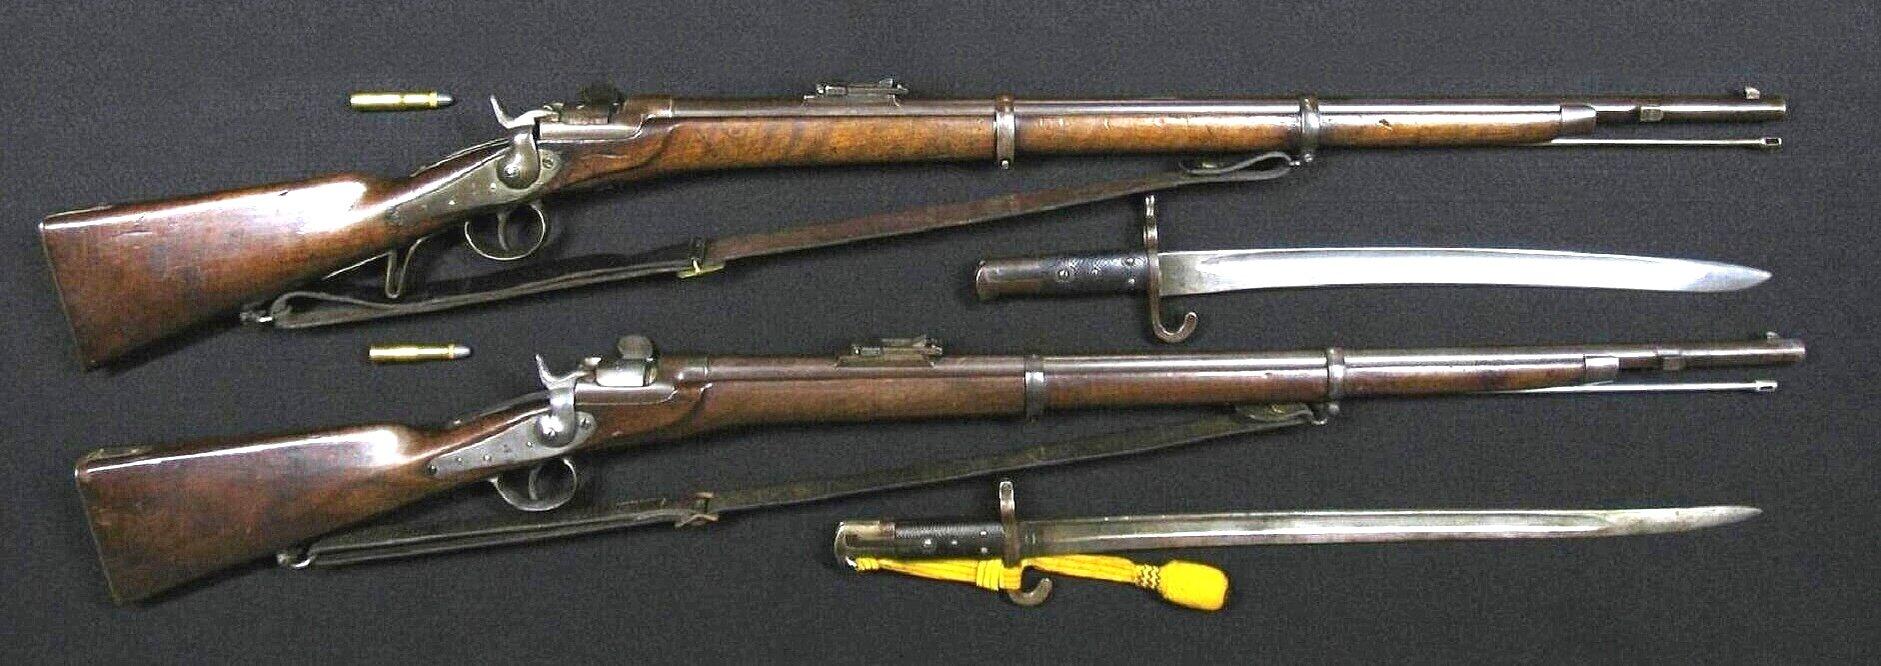 Click image for larger version.  Name:Werndl M1867-77 Rifles.jpg Views:30 Size:231.7 KB ID:1249785